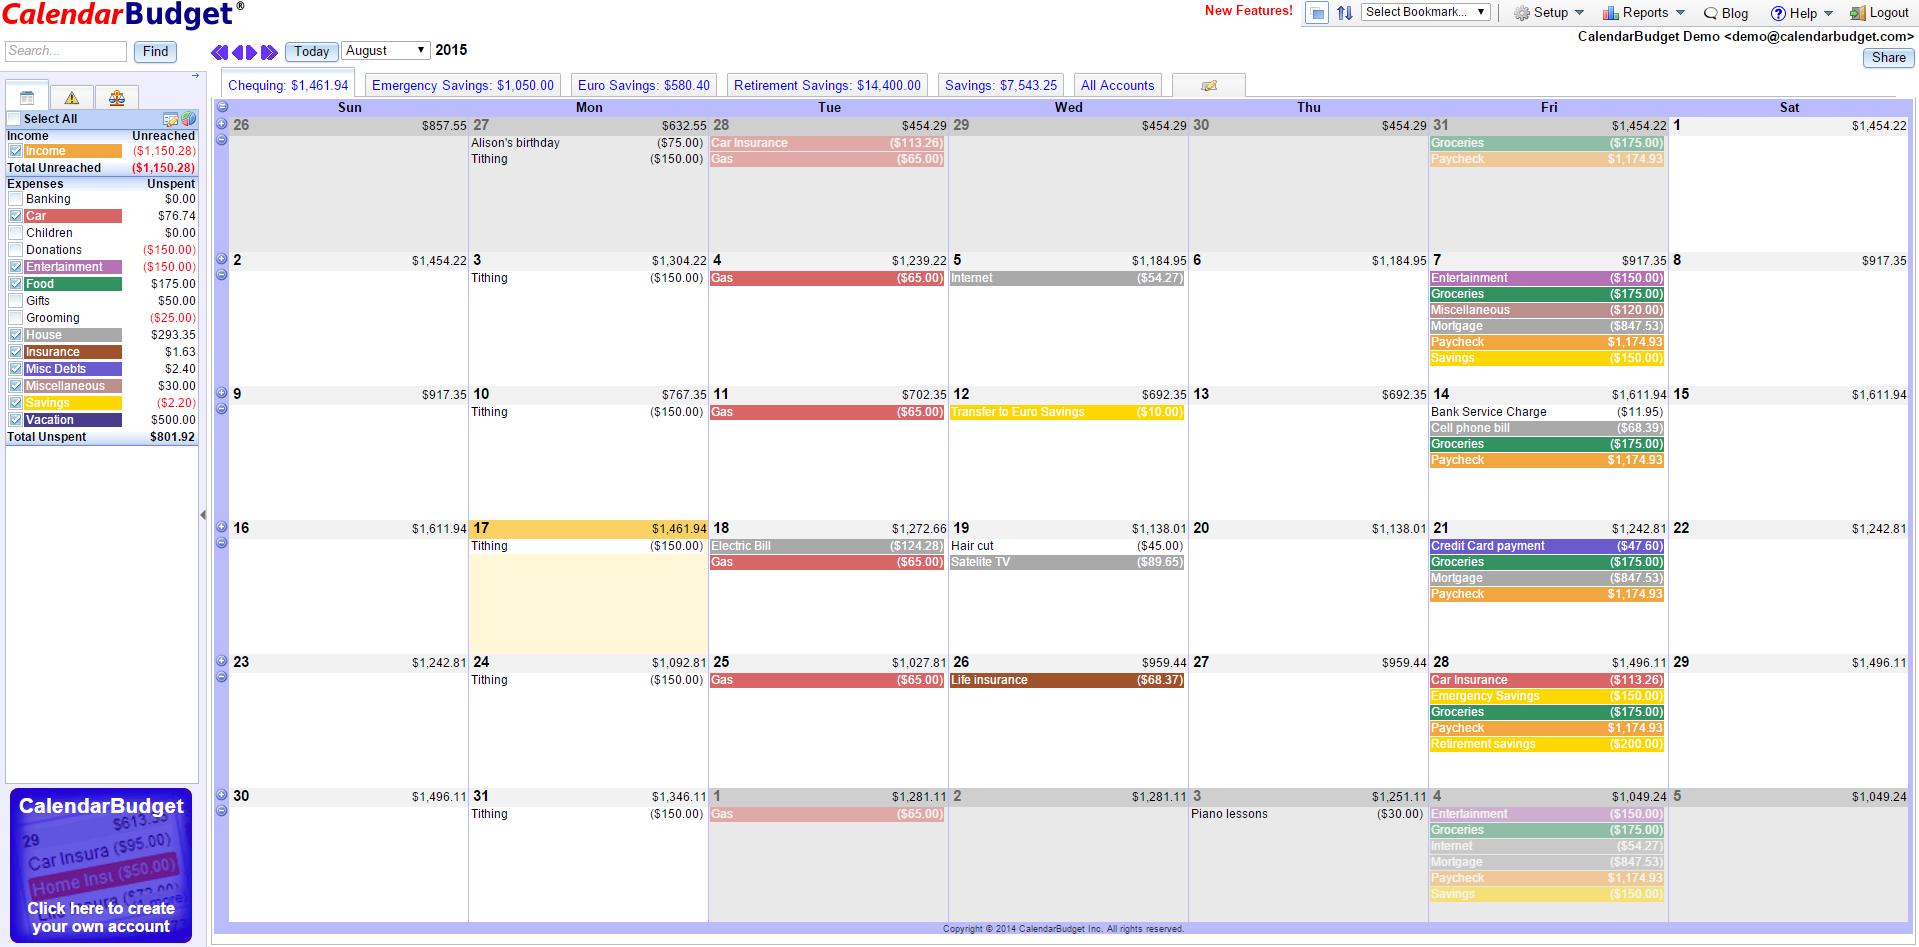 CalendarBudget Demo - Main Calendar Interface